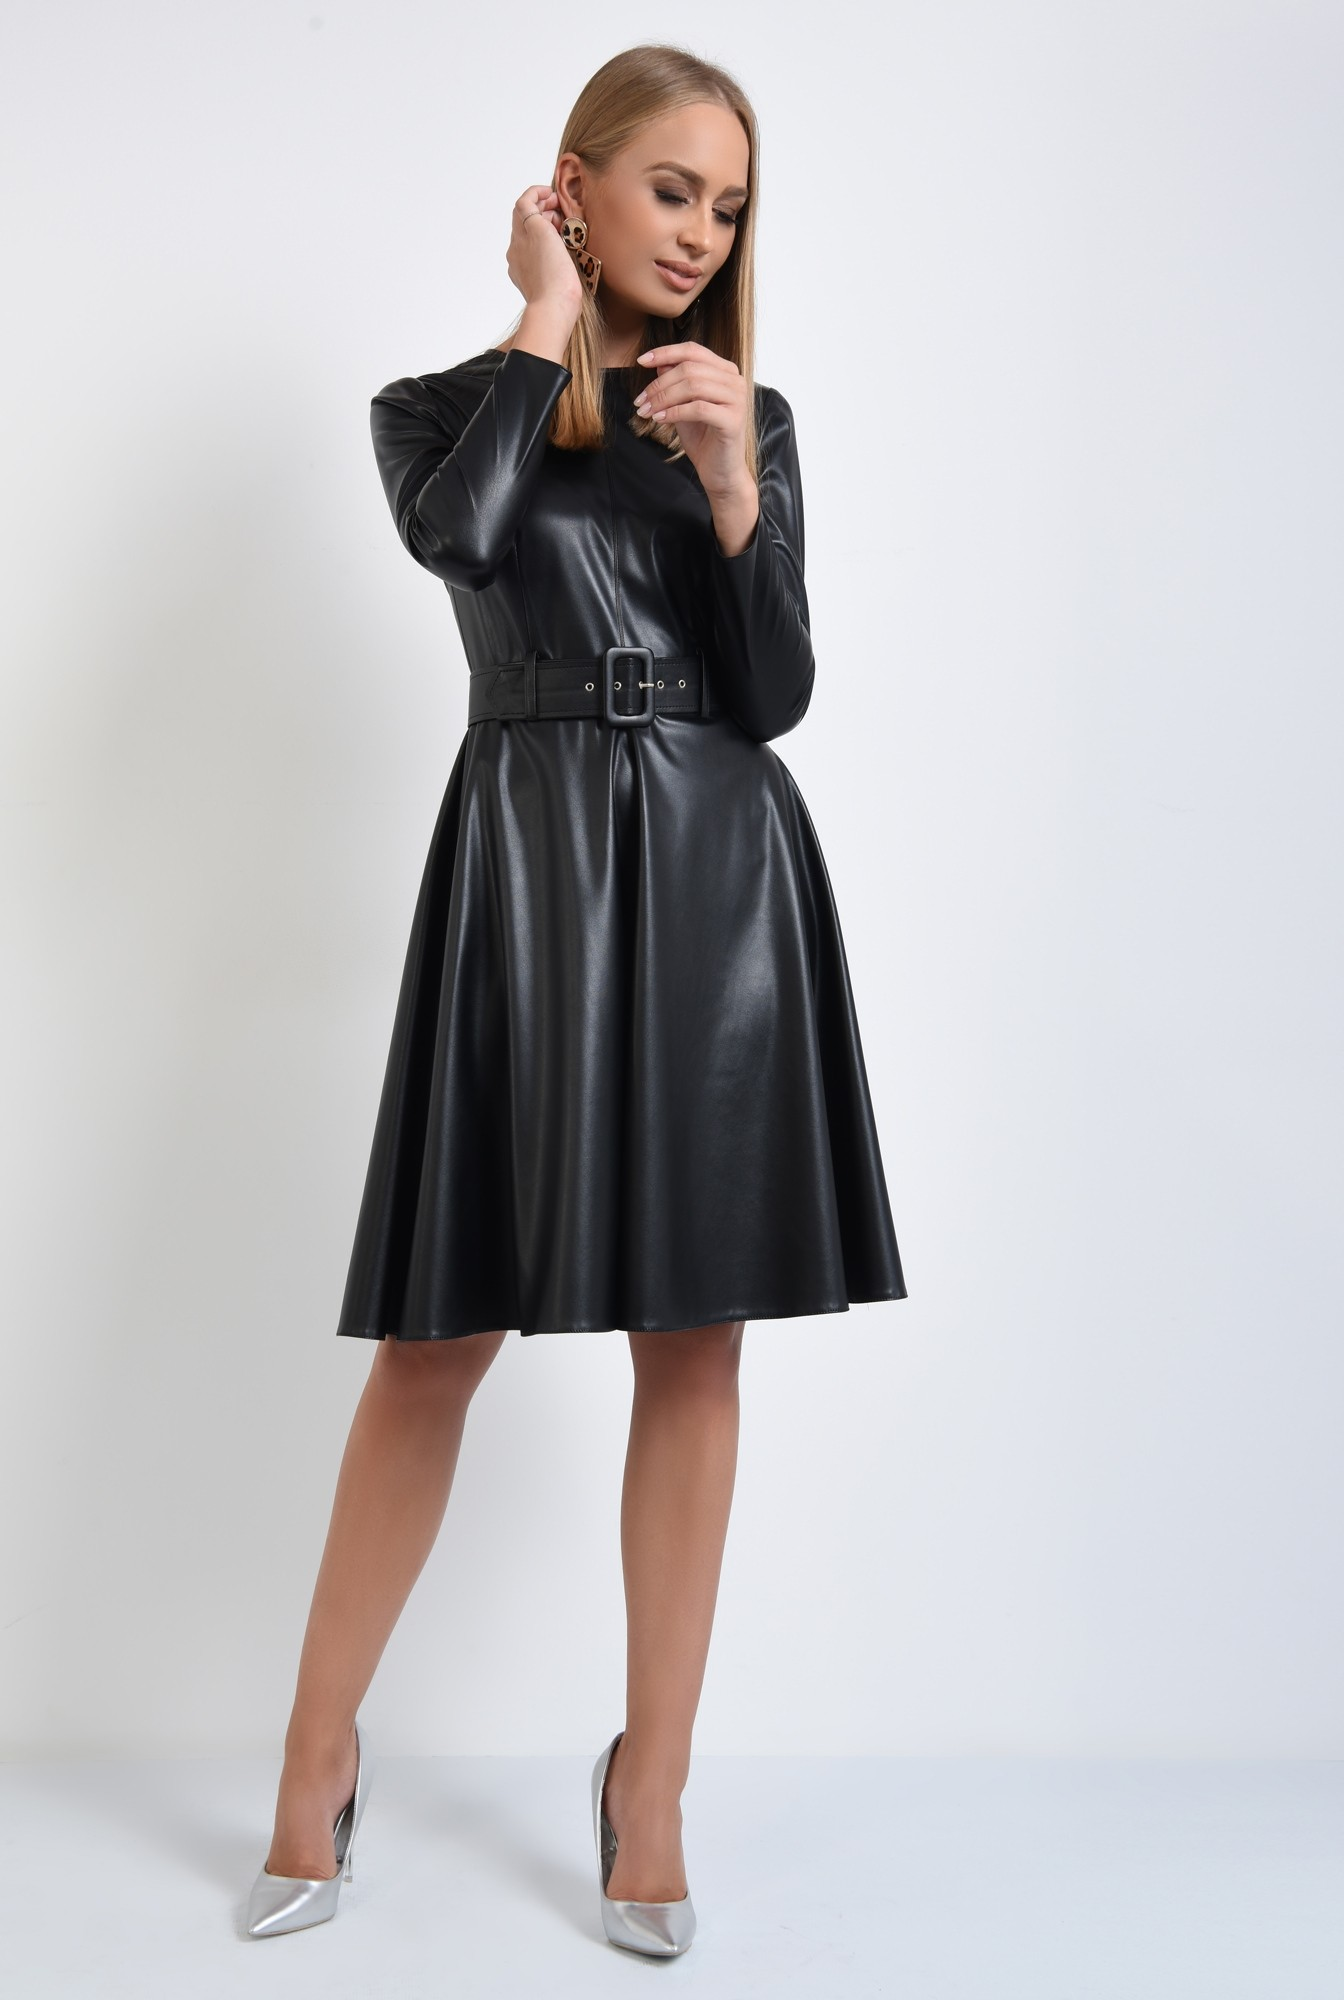 3 - rochie casual neagra, cusatura mediana, fermoar la spate, rochii online